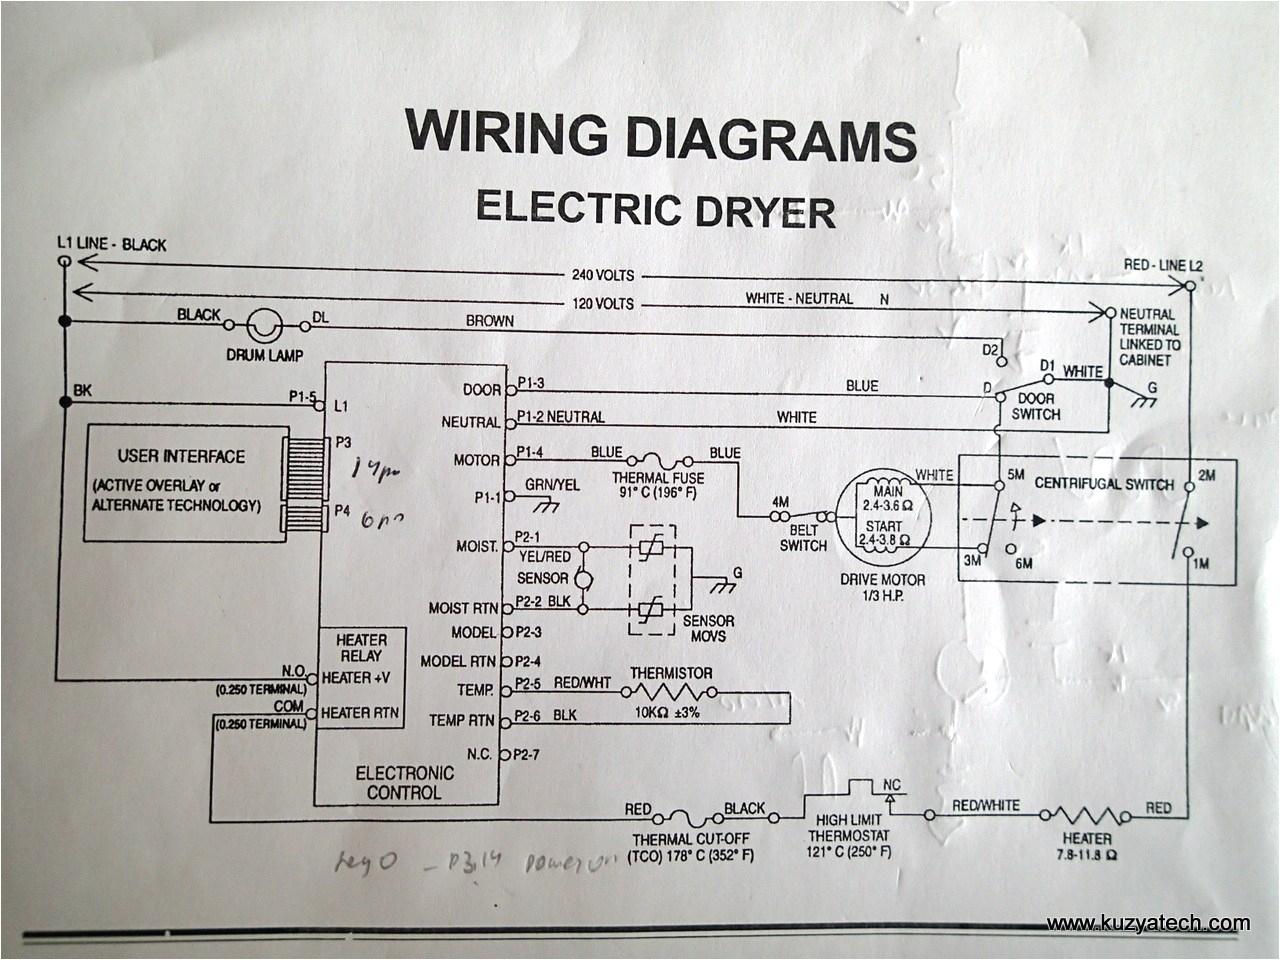 duet dryer wiring diagram wiring diagram megawhirlpool duet dryer wiring diagram wiring diagram database whirlpool duet